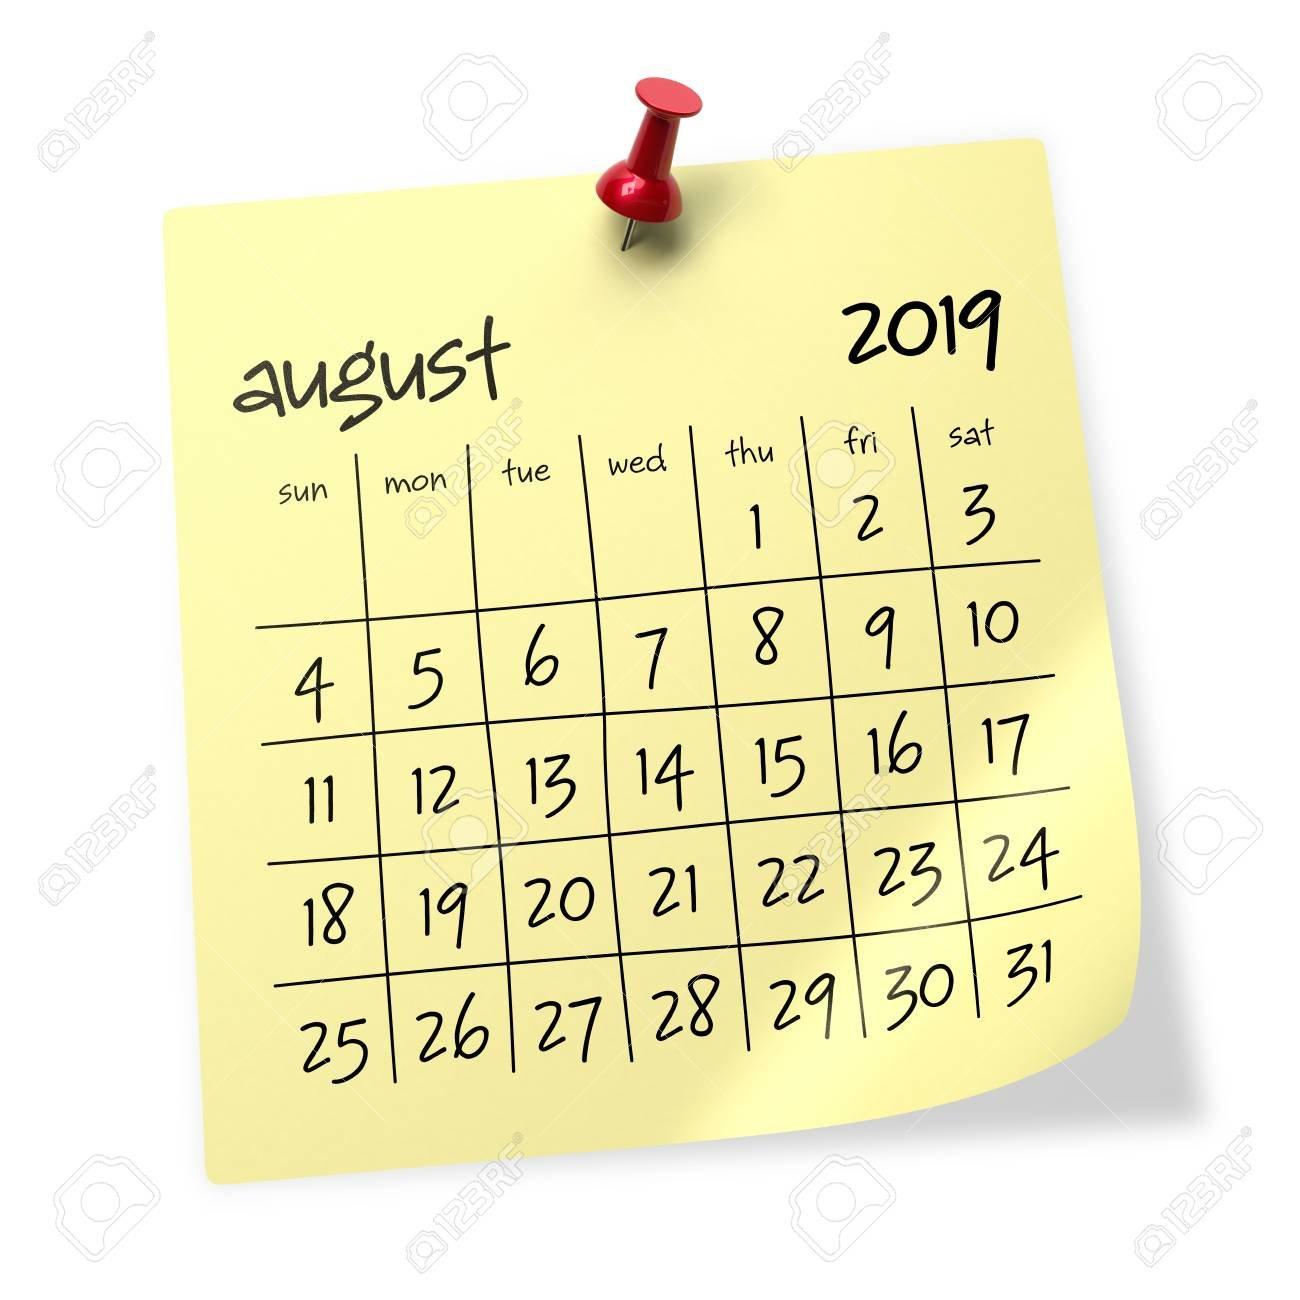 August 2019 Calendar. Isolated On White Background. 3D Illustration August 3 2019 Calendar